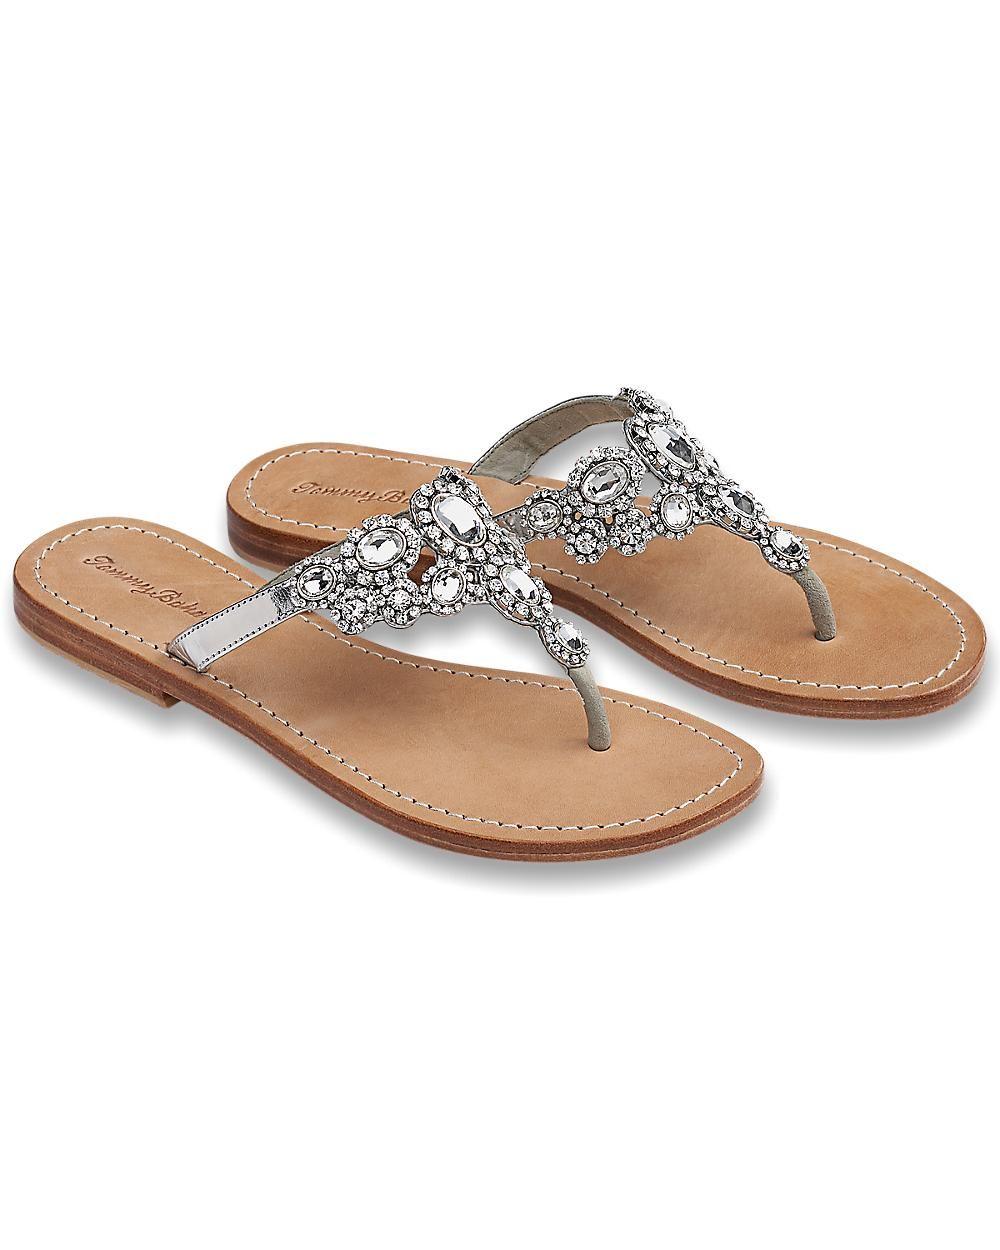 9bea155b05e742 Crystal Flat Sandals